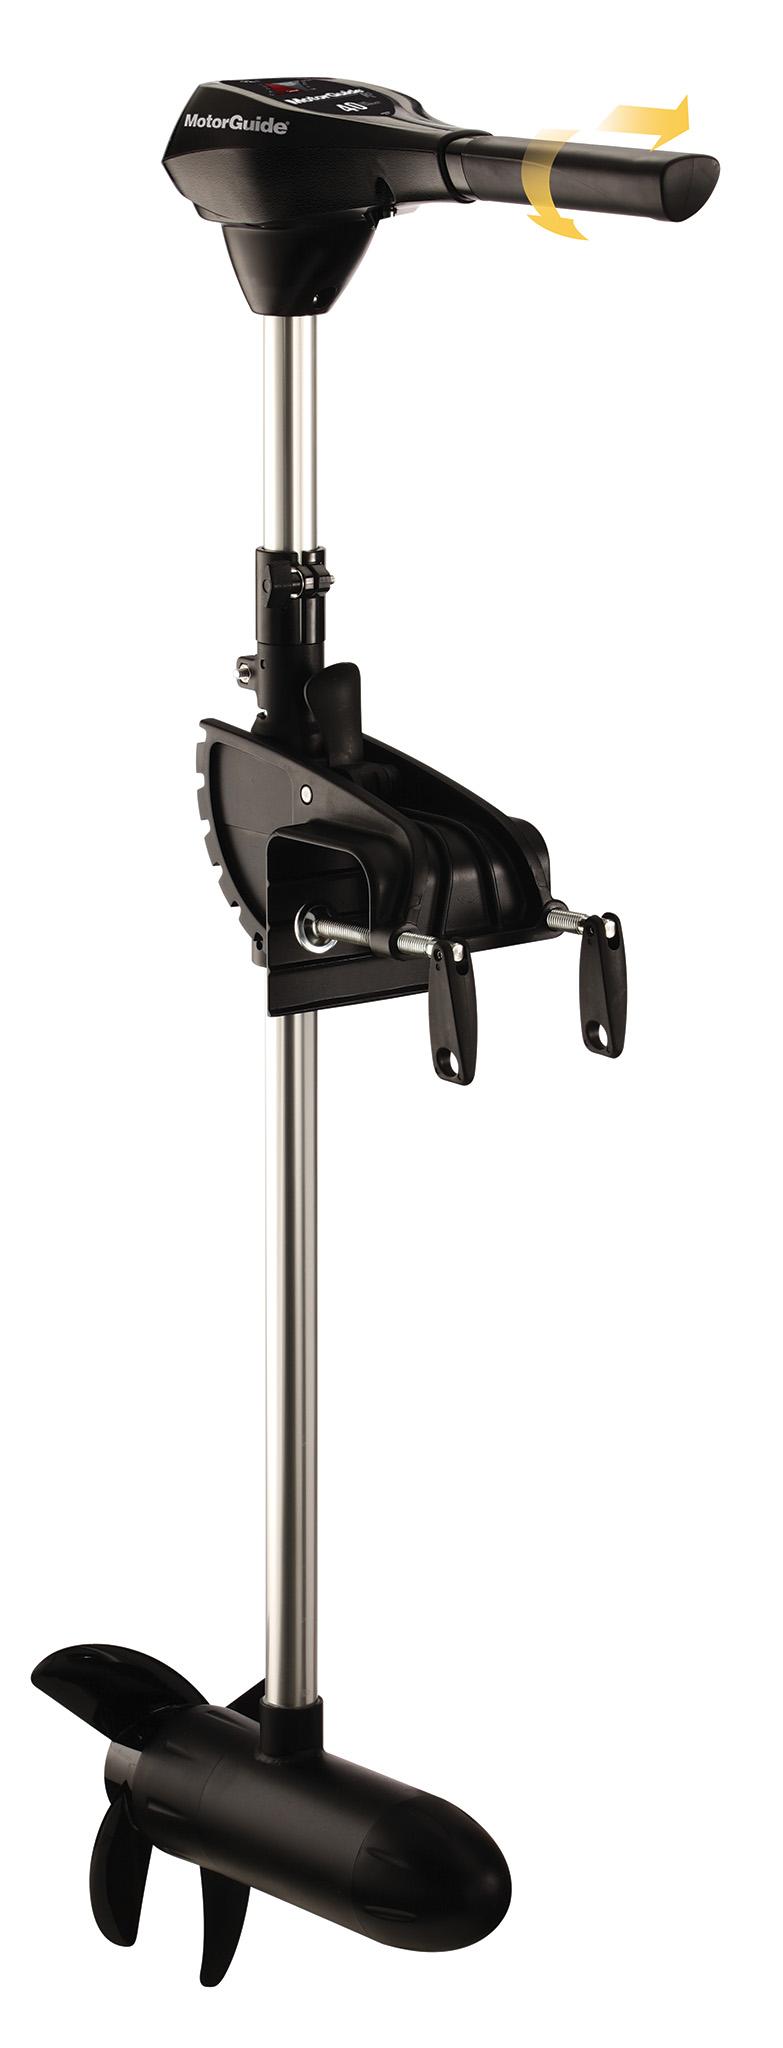 MotorGuide R3 - 30 HT 30 Heckmontage, Stufengeschaltet – Bild 2